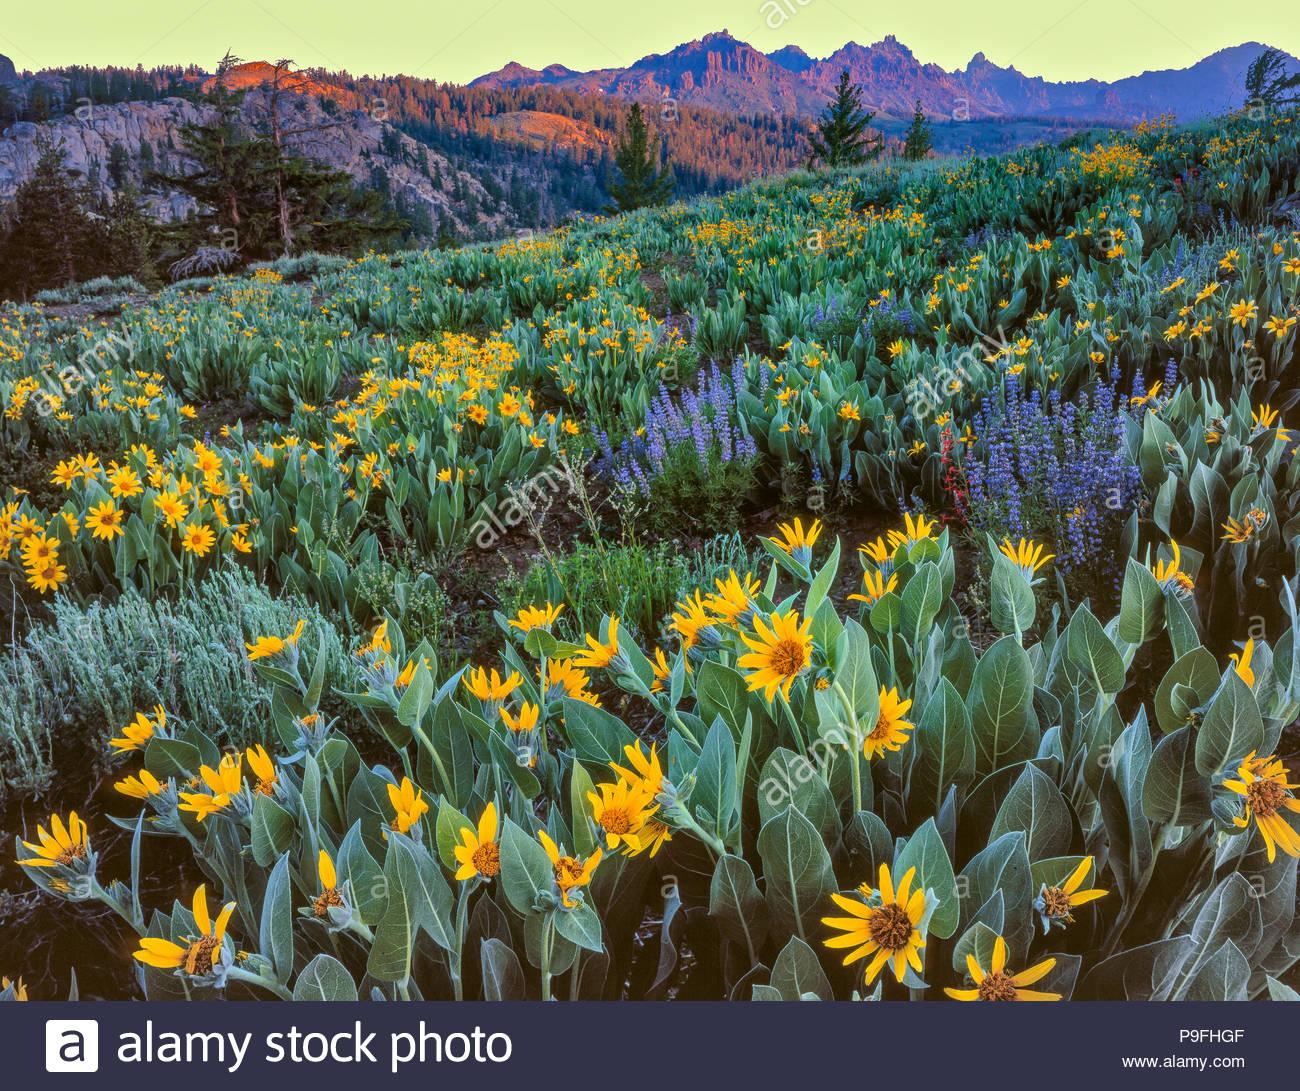 Arrowleaf Balsam Root, Balsamorhiza sagittata, Lupin, Lupinus angustifolius, Carson-Iceberg Wilderness, Toiyabe National Forest, Sierra Nevada, CA - Stock Image